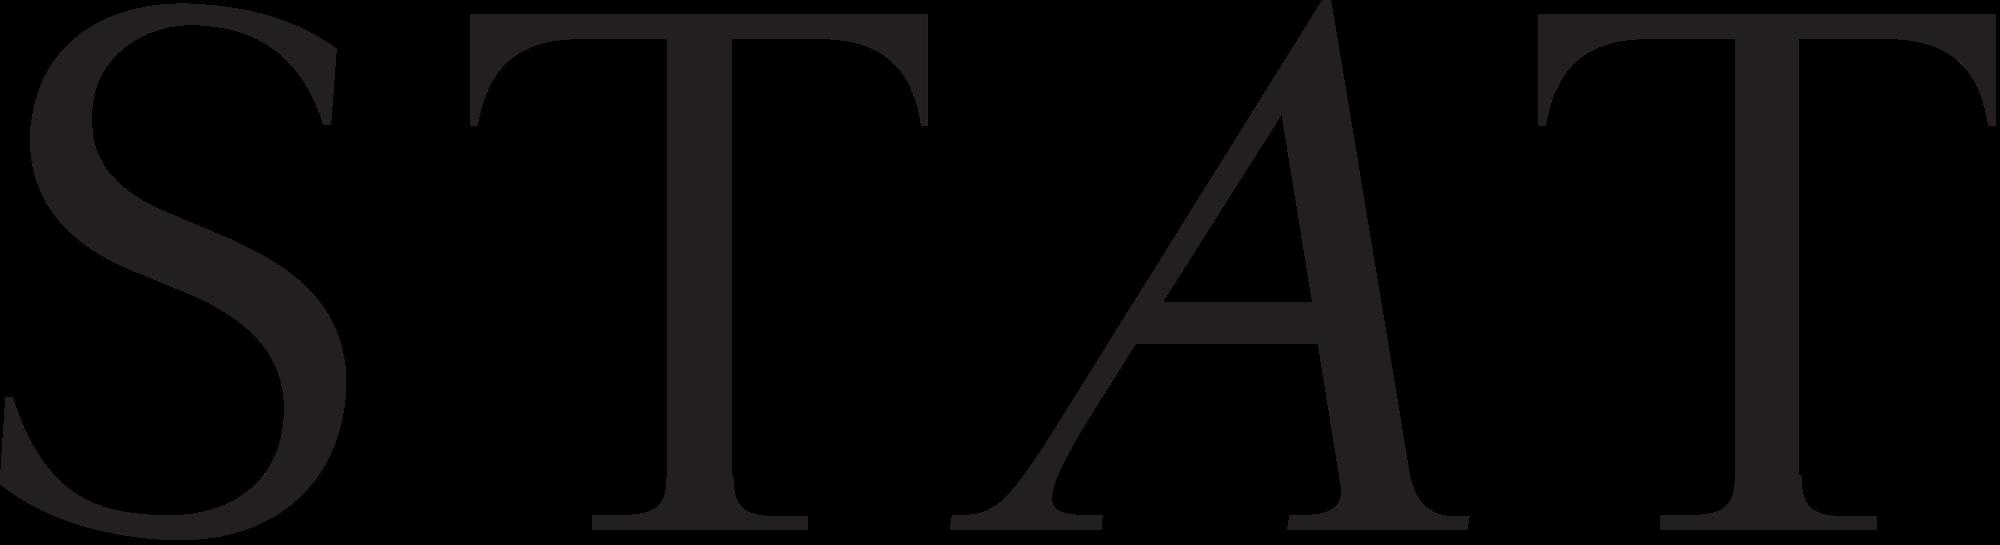 Stat_News_logo.png